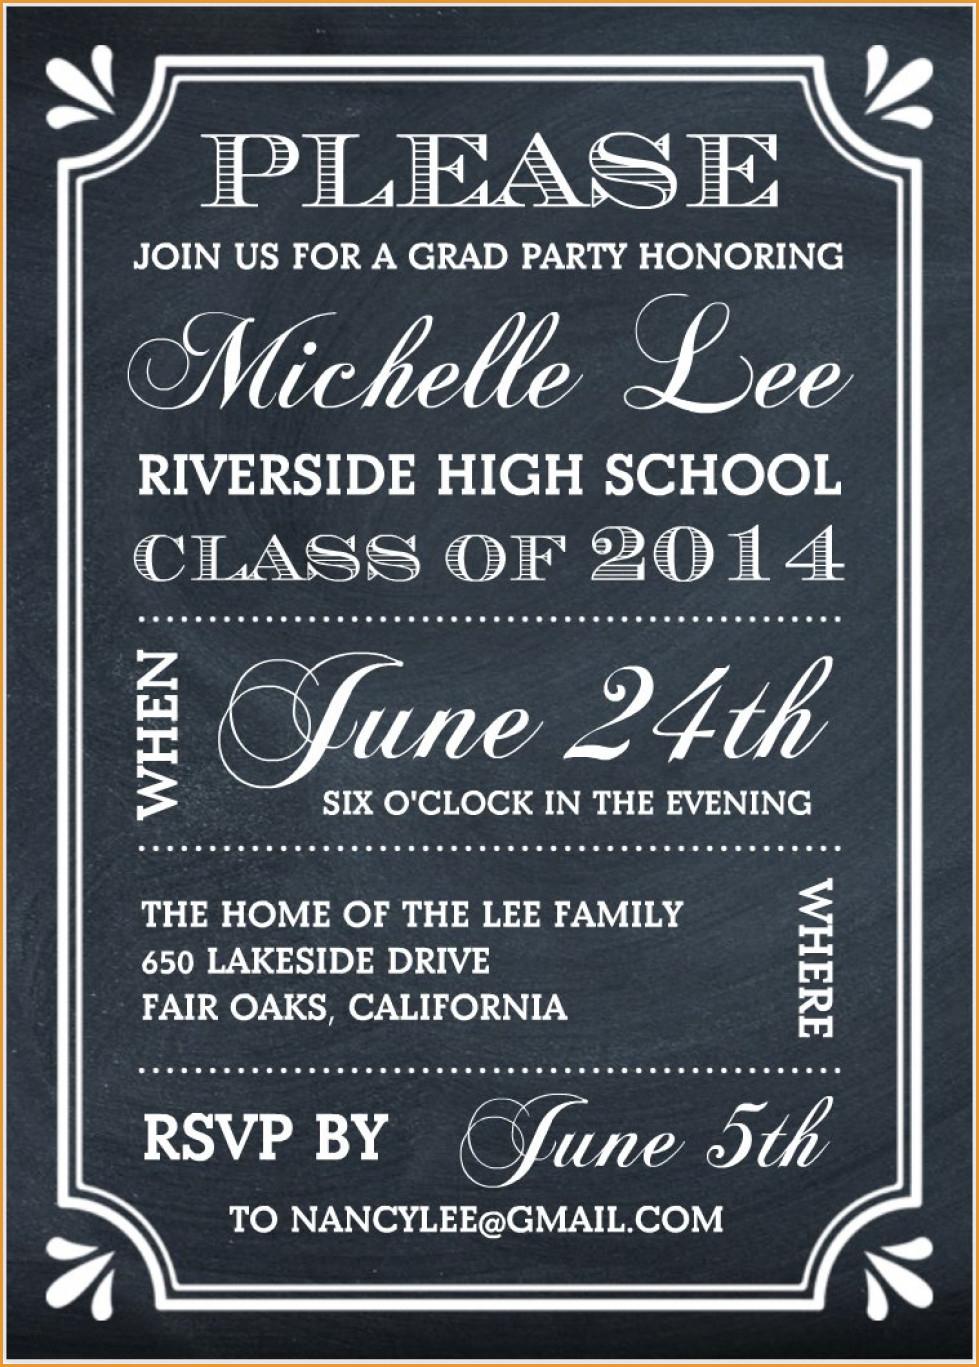 Party Invitations: Elegant Free Graduation Party Invitations Designs - Free Printable Graduation Invitations 2014